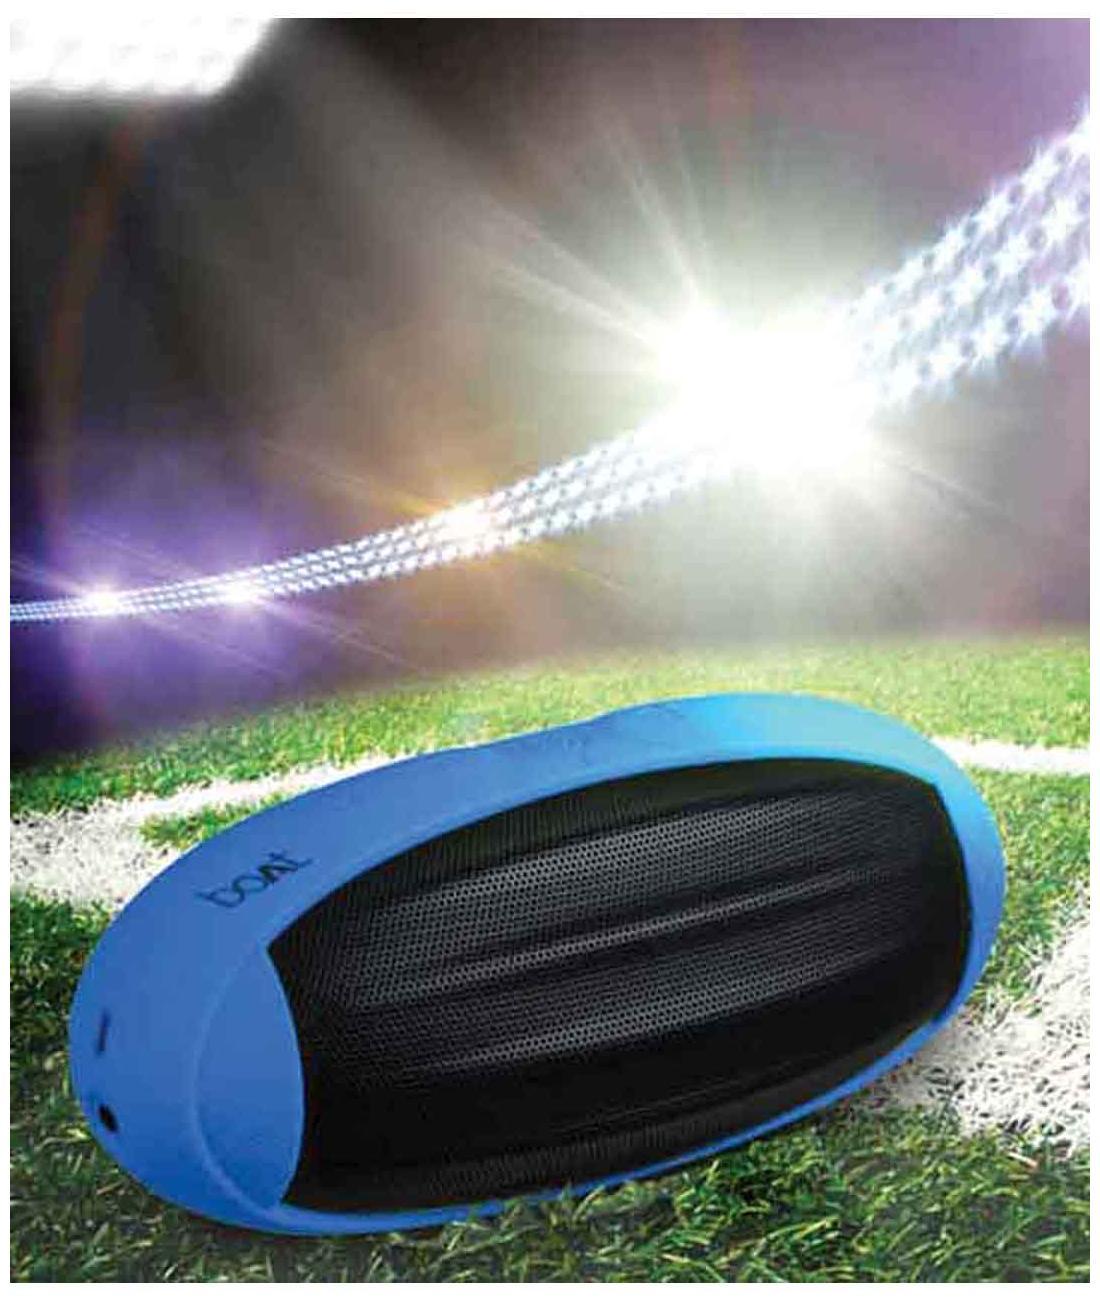 Boat Rugby Bluetooth Speaker (Black & Blue)